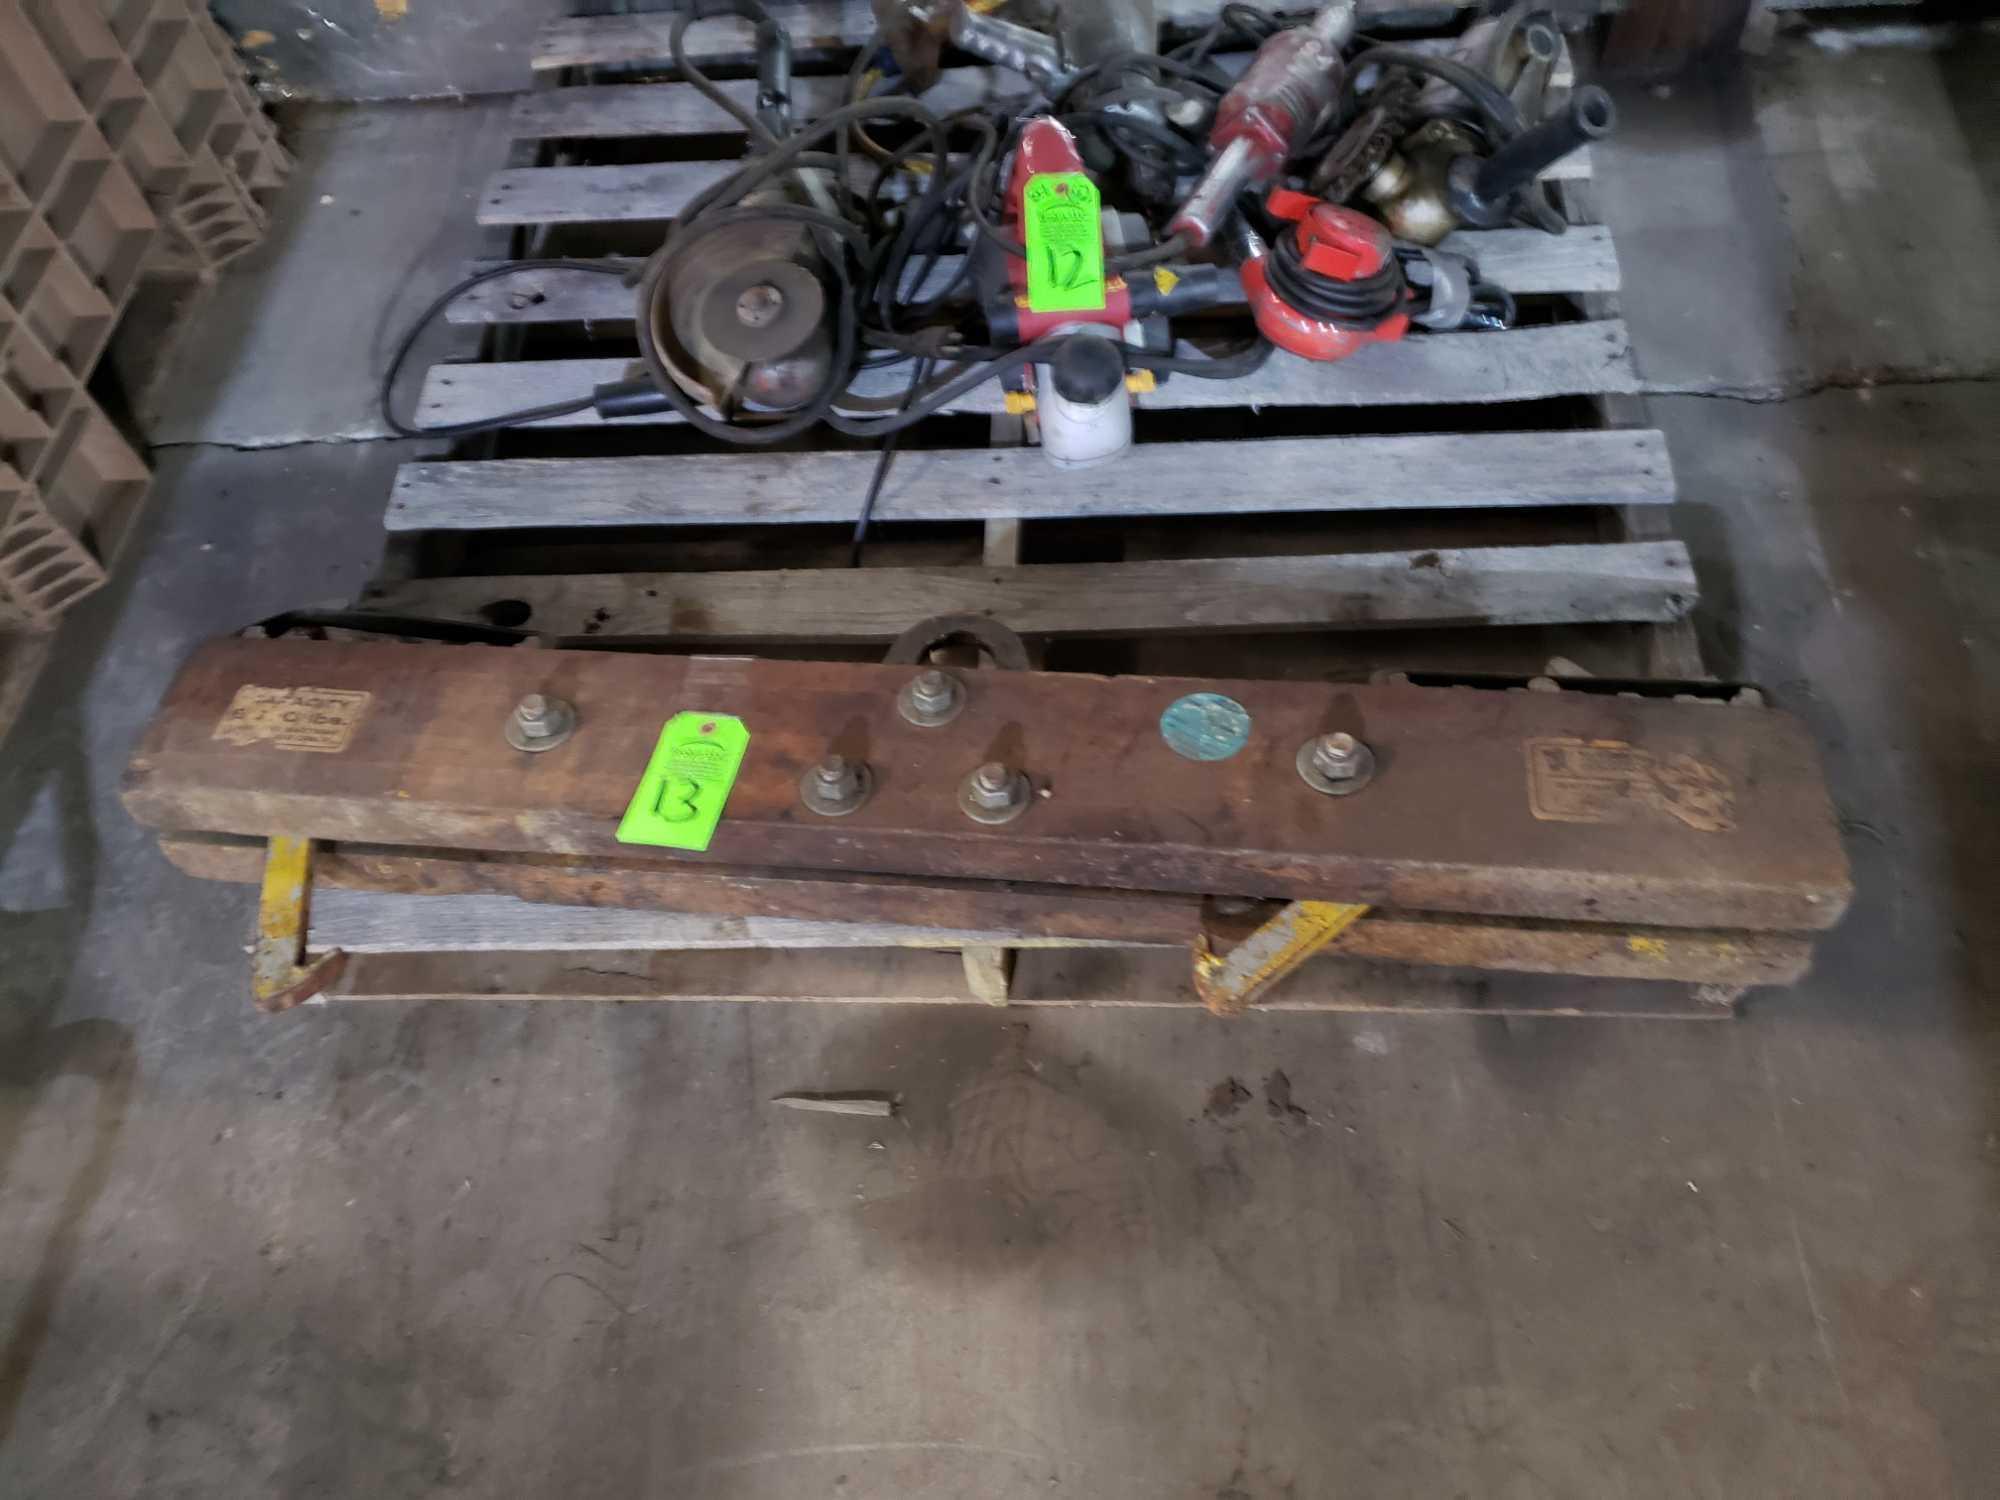 Lot 13 - Material Transport Company forklift battery handler. 6000lb capacity